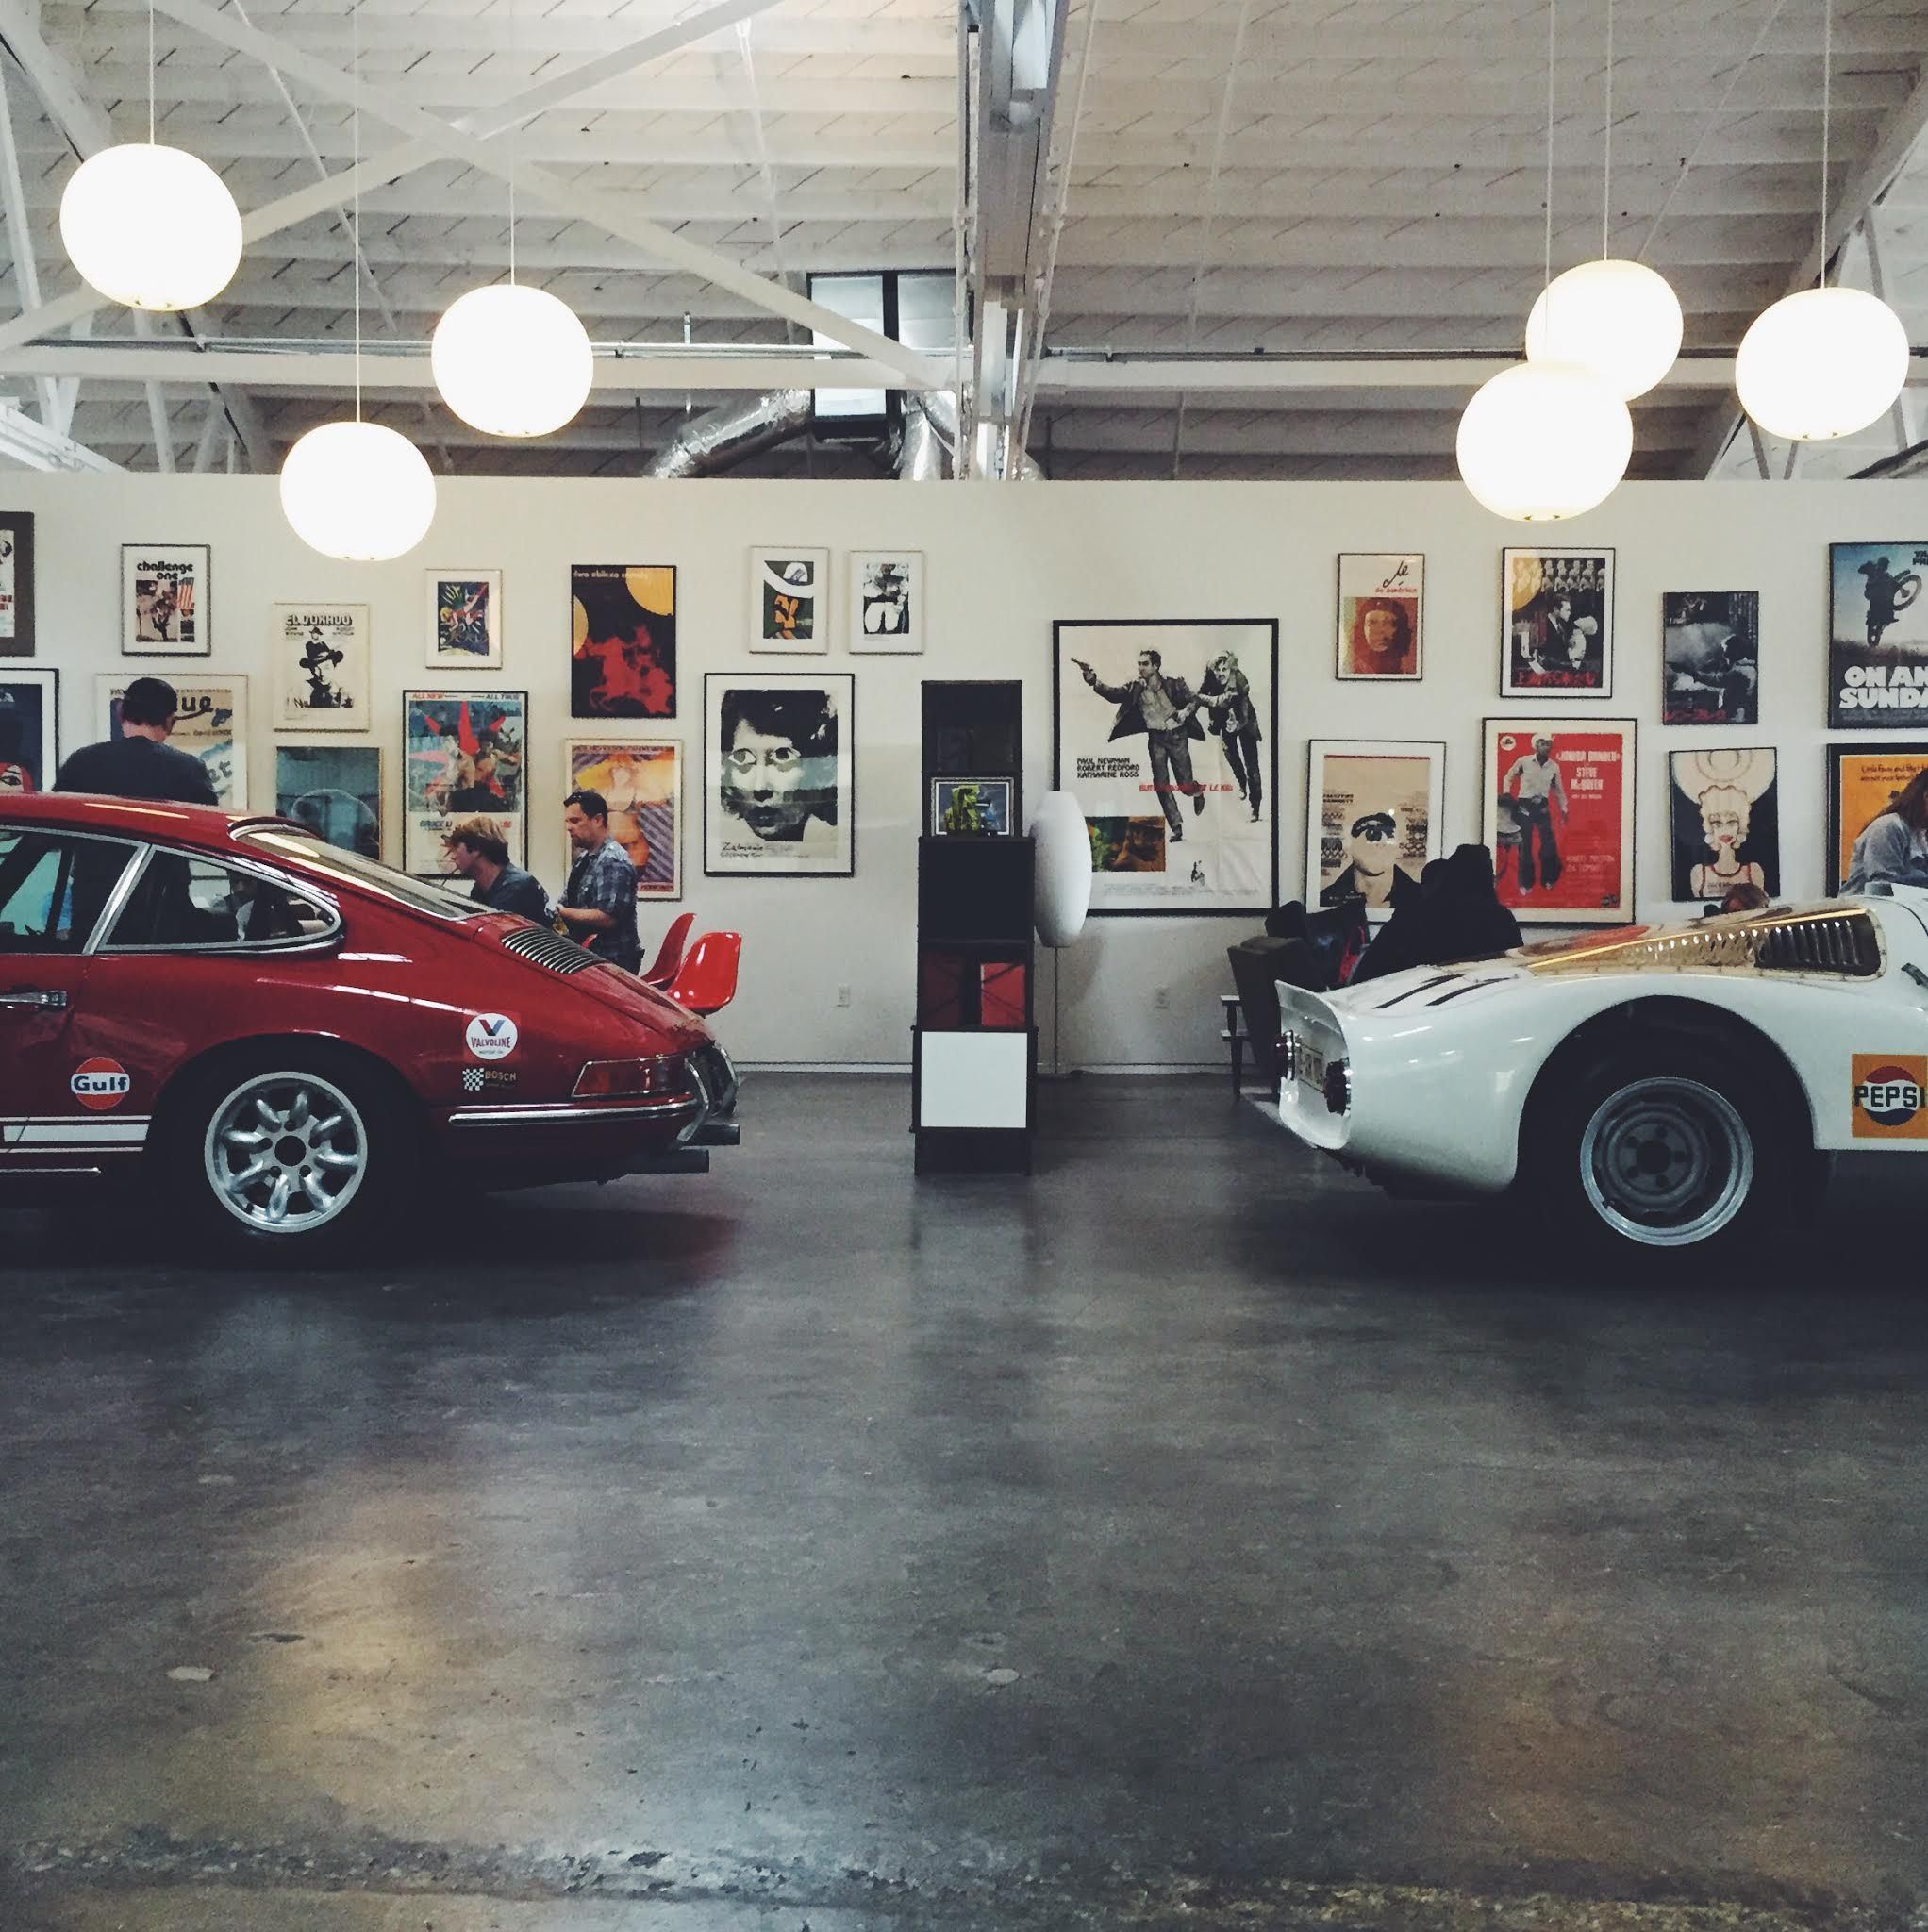 Luftgekuhlt at the shop #BanditoBTS @Luftgekuhlt @DeusEmporium @Porsche @PLMotorsport @ZwartSpeed @rbslavin